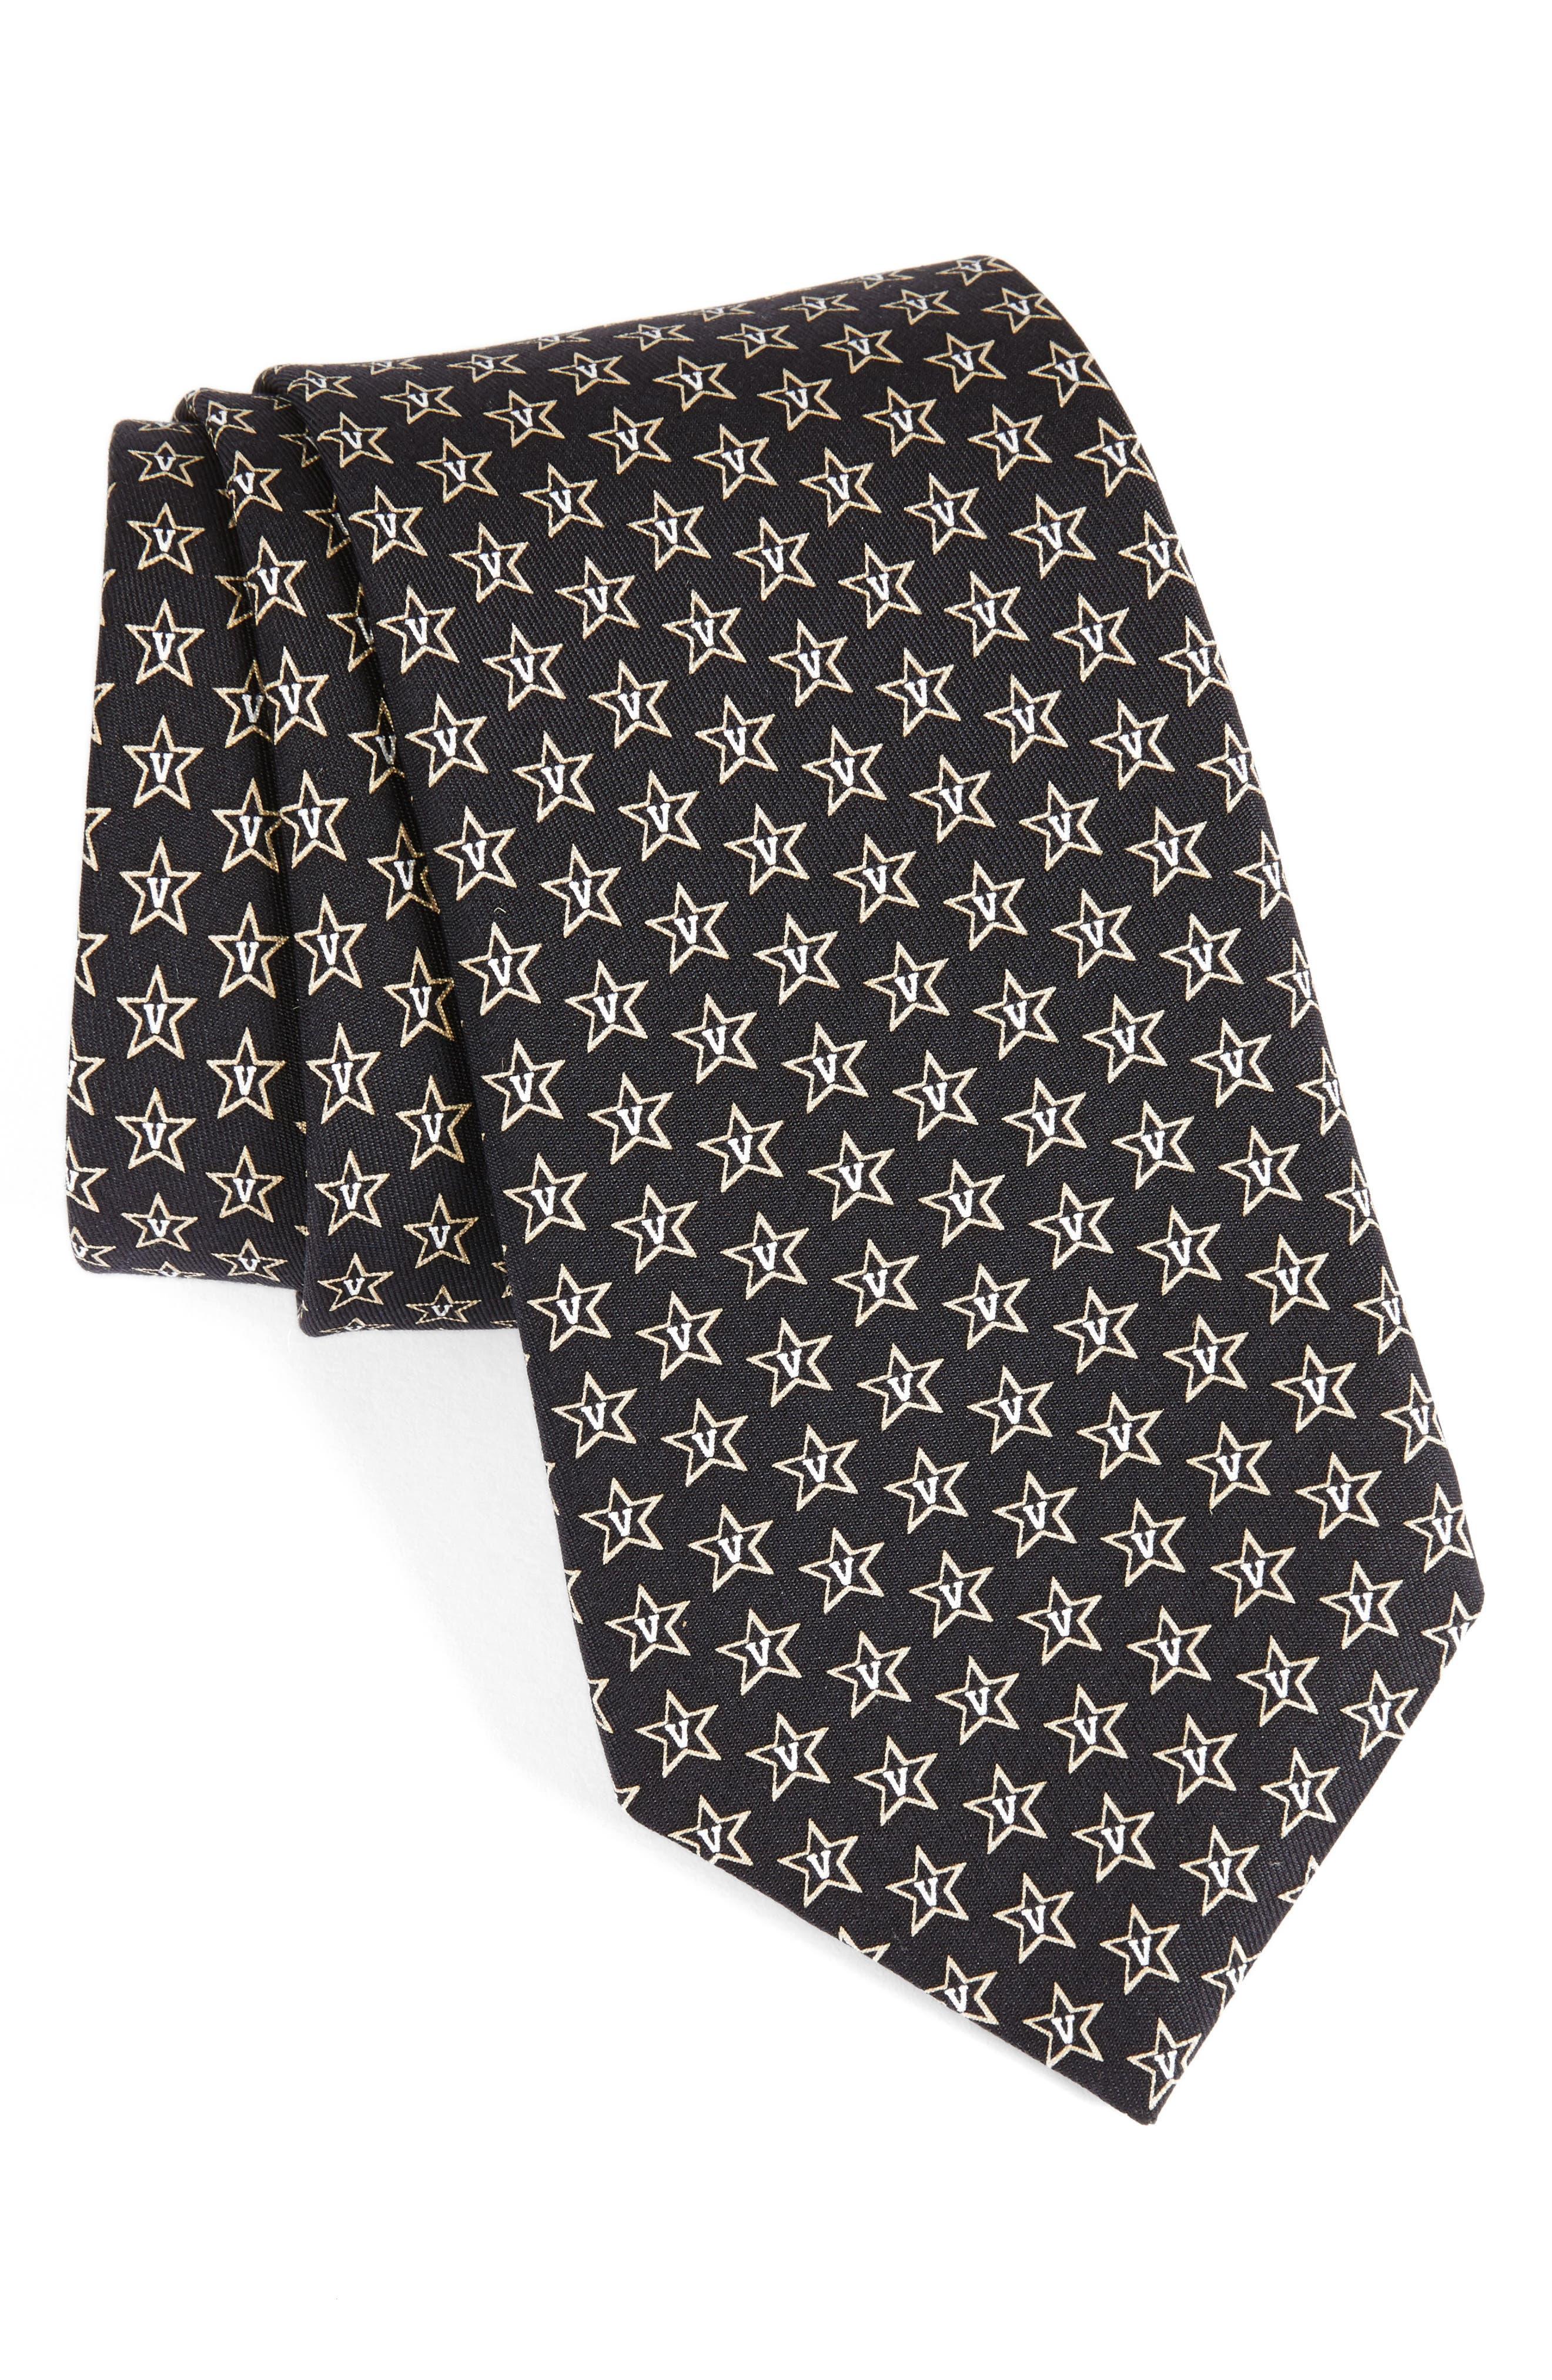 Vanderbilt University Silk Tie,                             Main thumbnail 1, color,                             001